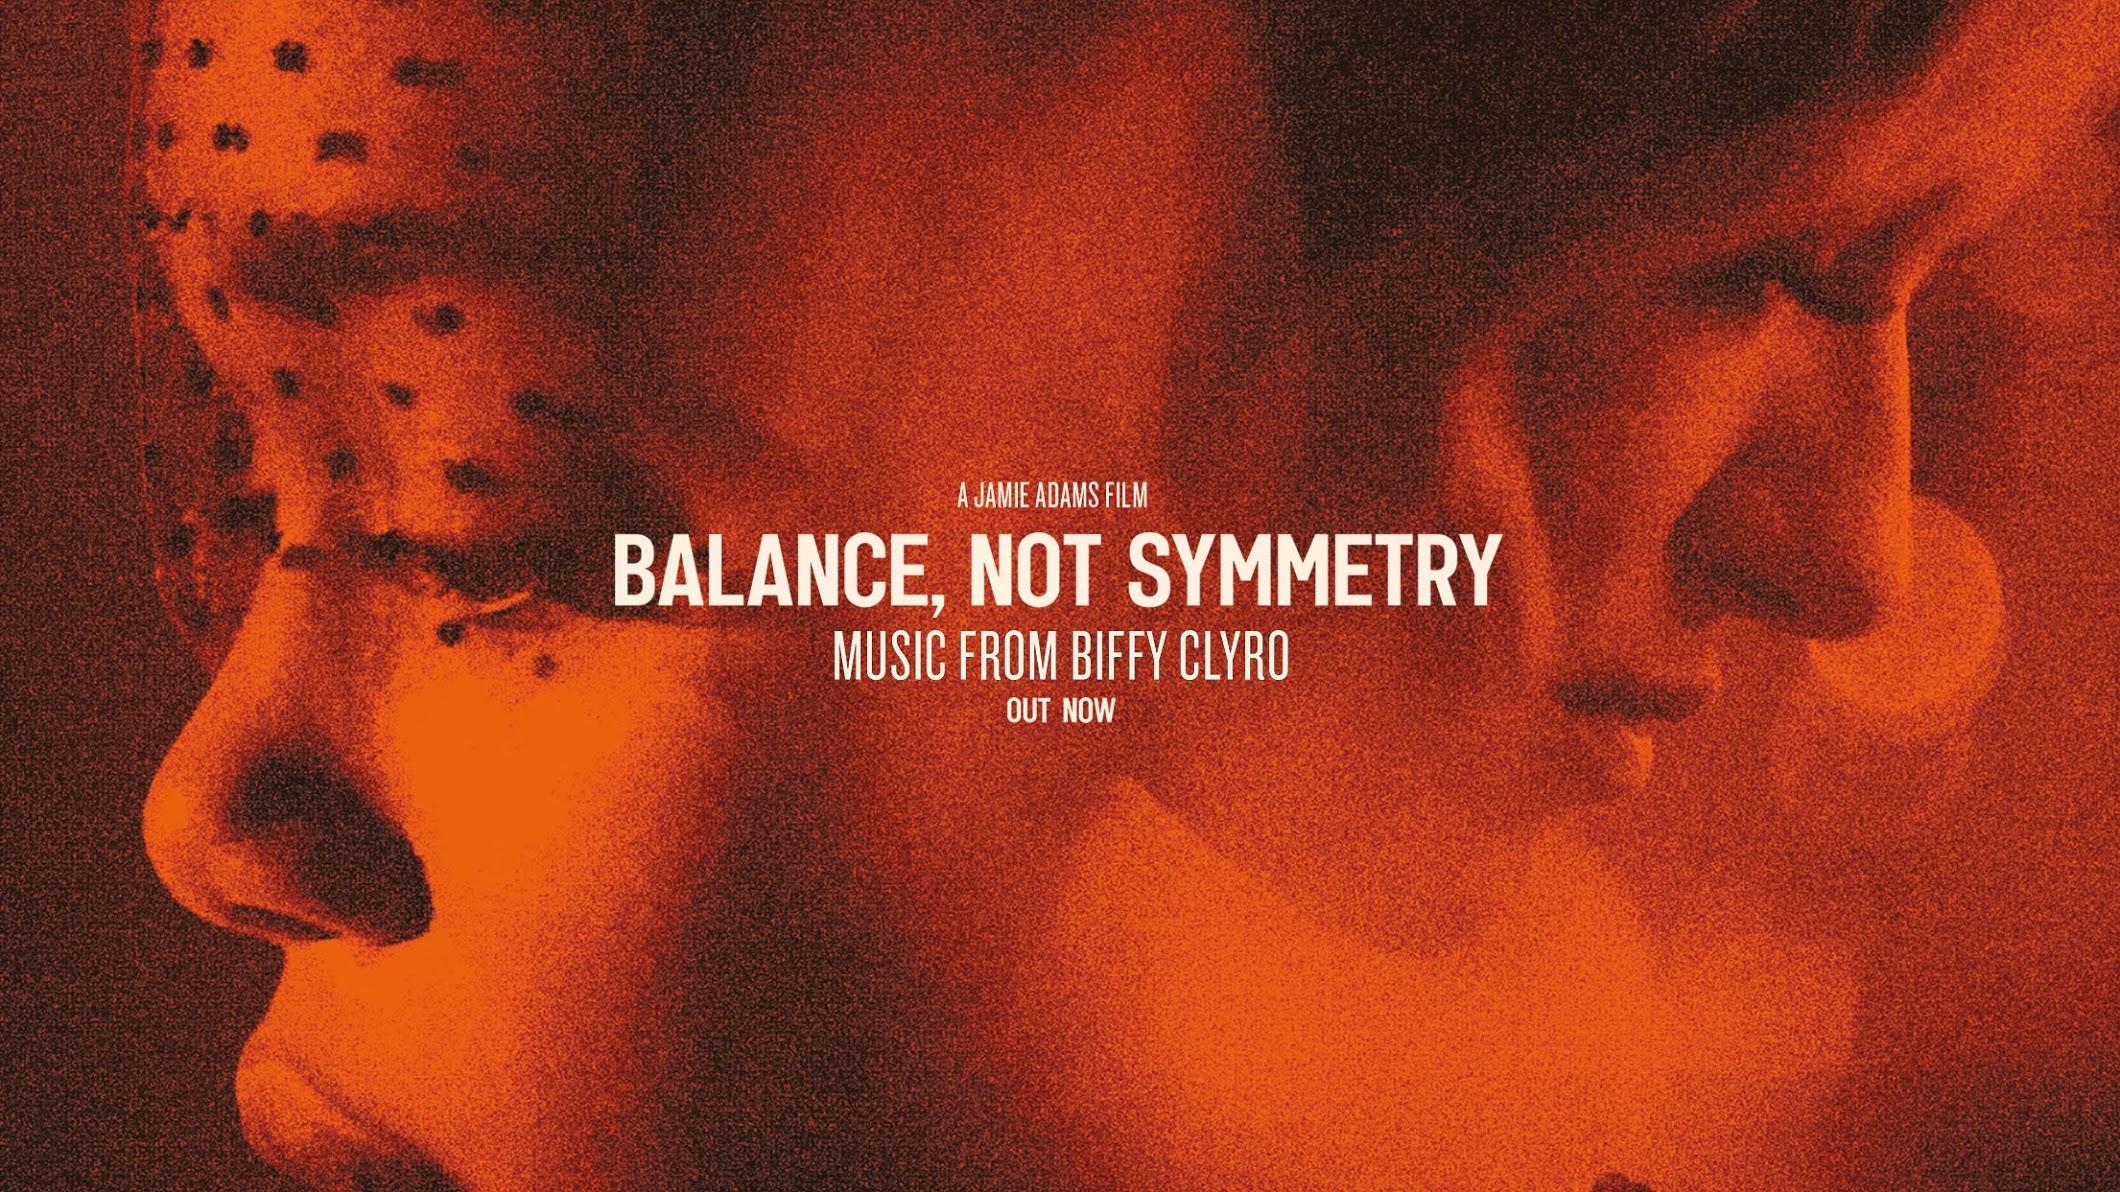 BALANCE, NOT SYMMETRY (2019) - VISUAL EFFECTS